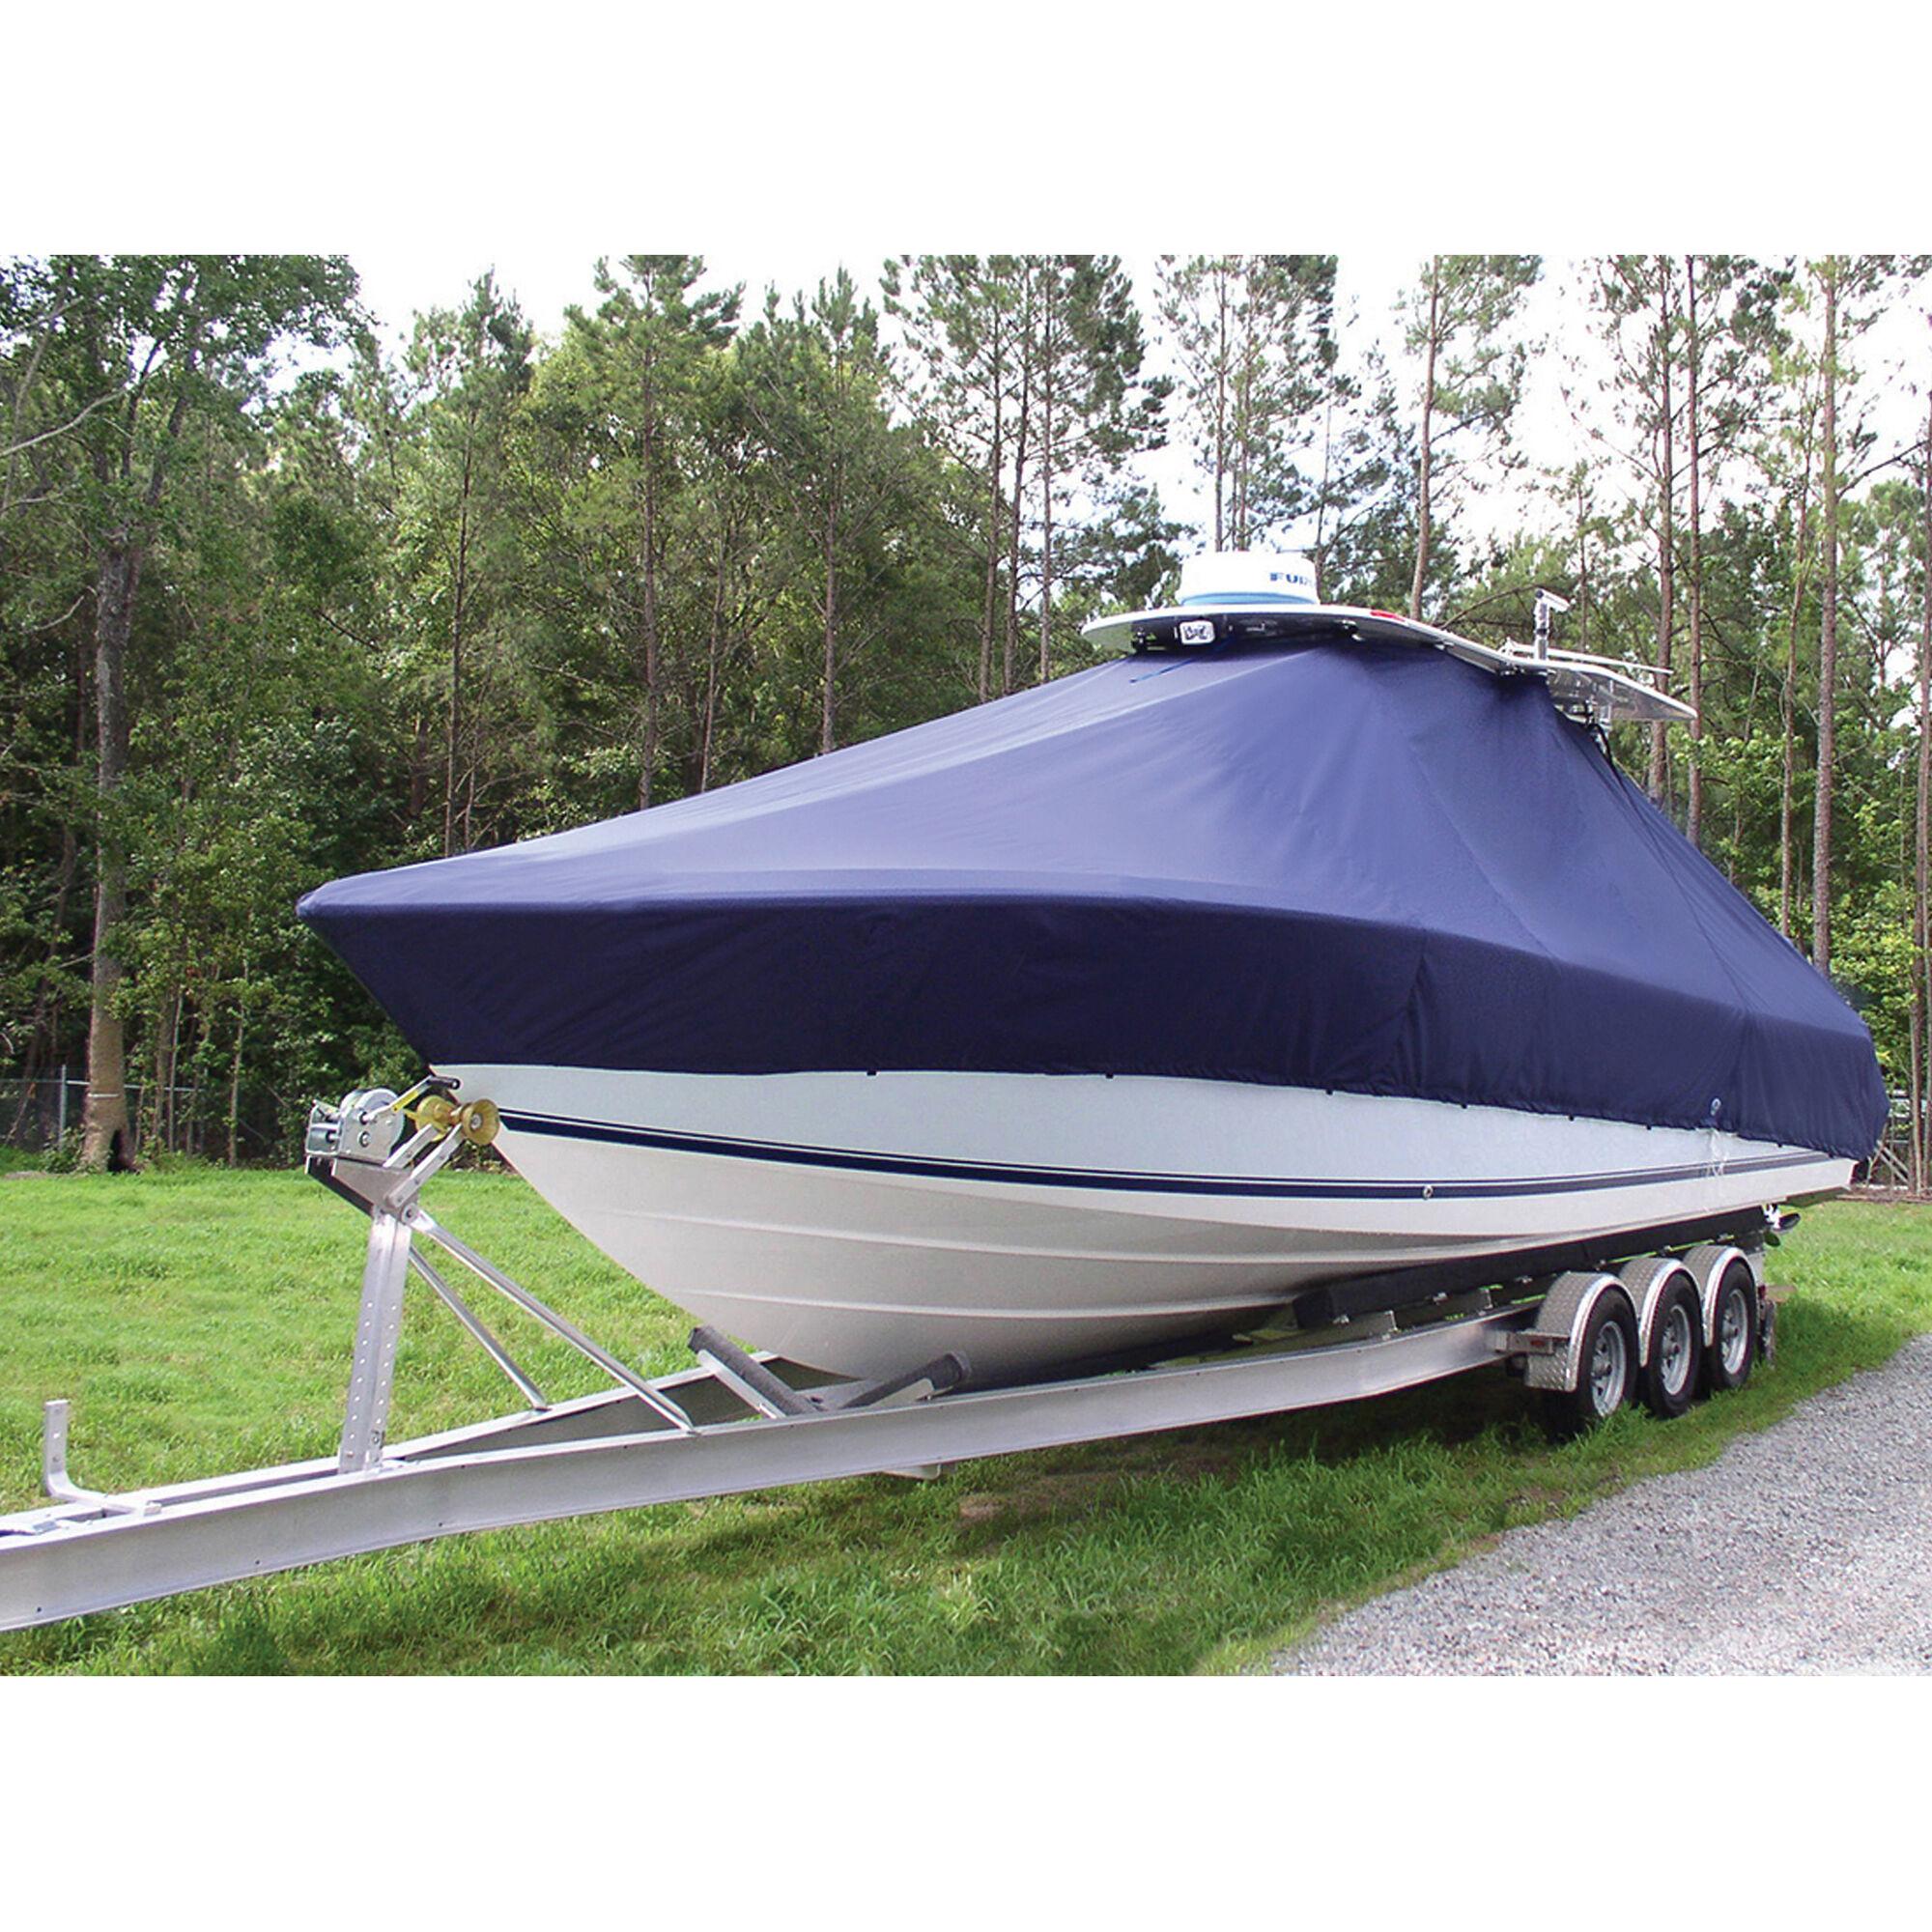 Taylor Made Large Marine Electronic Instrument Cover,Boat Fish//Depthfinder,New